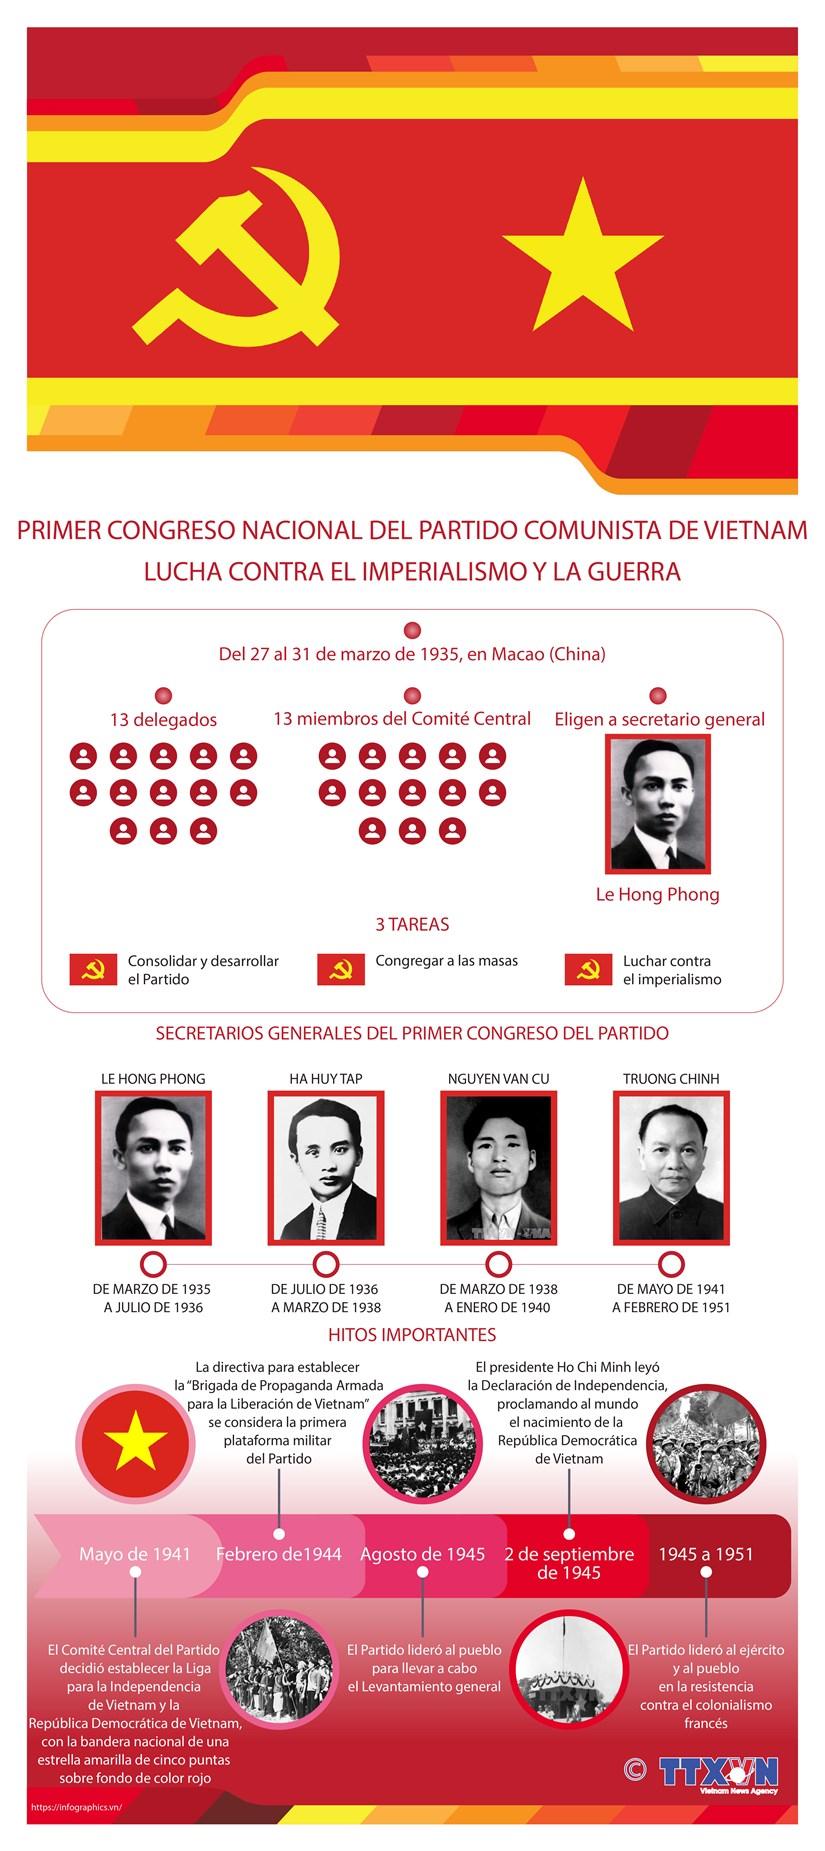 PRIMER CONGRESO NACIONAL DEL PARTIDO COMUNISTA DE VIETNAM hinh anh 1